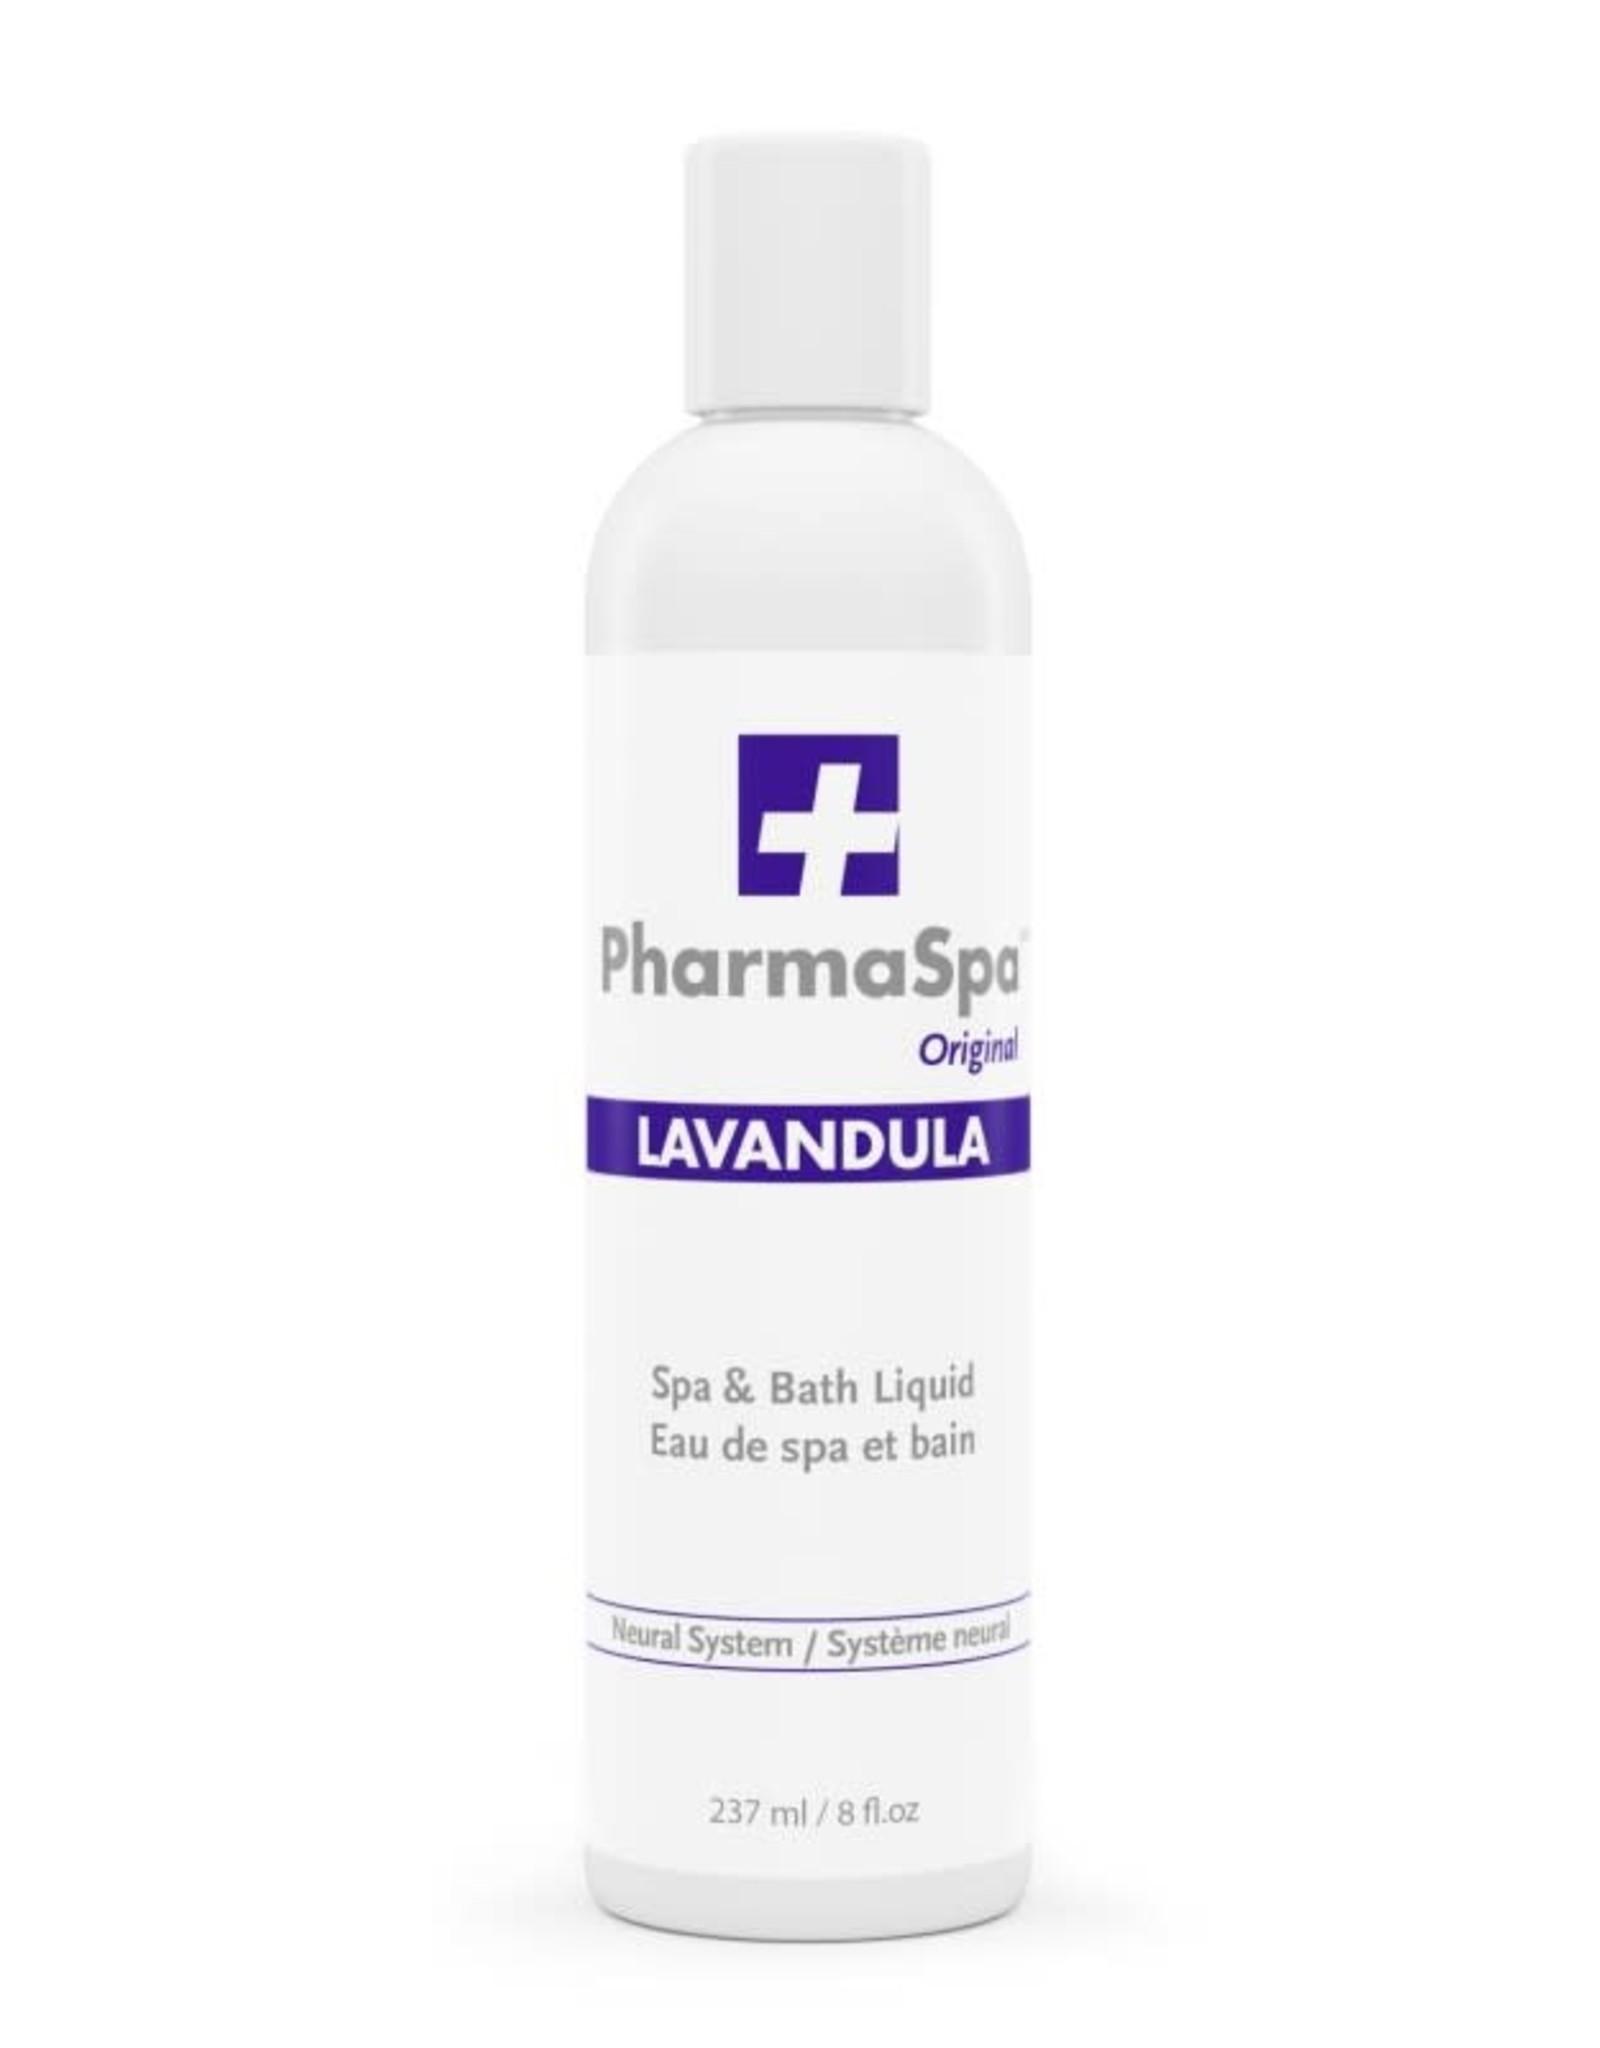 PHARMA SPA pharma spa lavandula